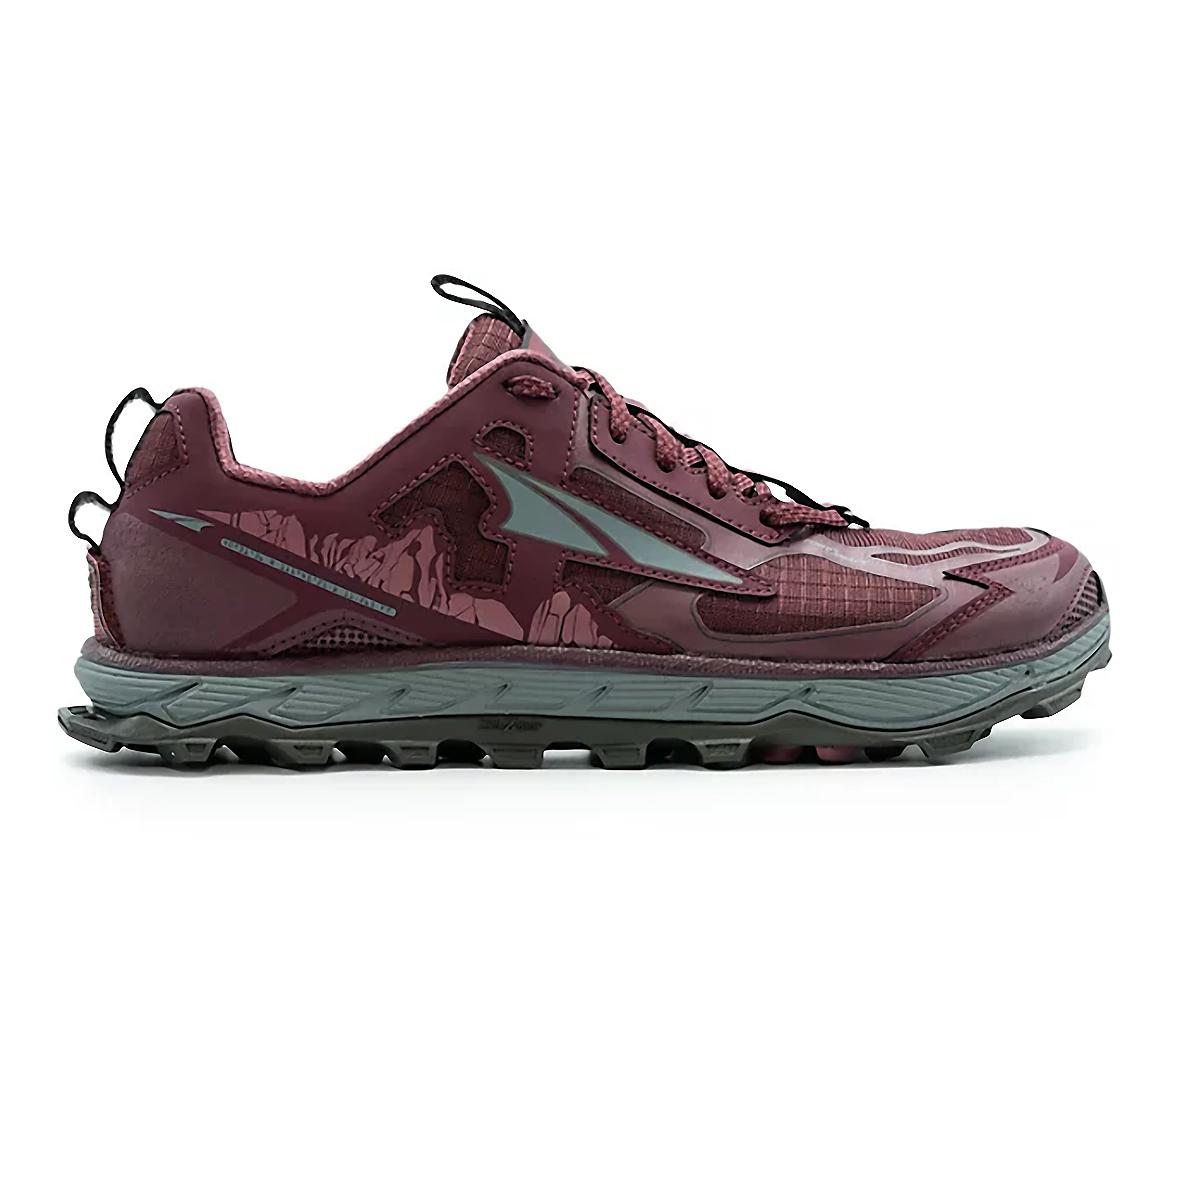 Women's Altra Lone Peak 4.5 Low Trail Running Shoe - Color: Dark Port - Size: 5.5 - Width: Regular, Dark Port, large, image 1